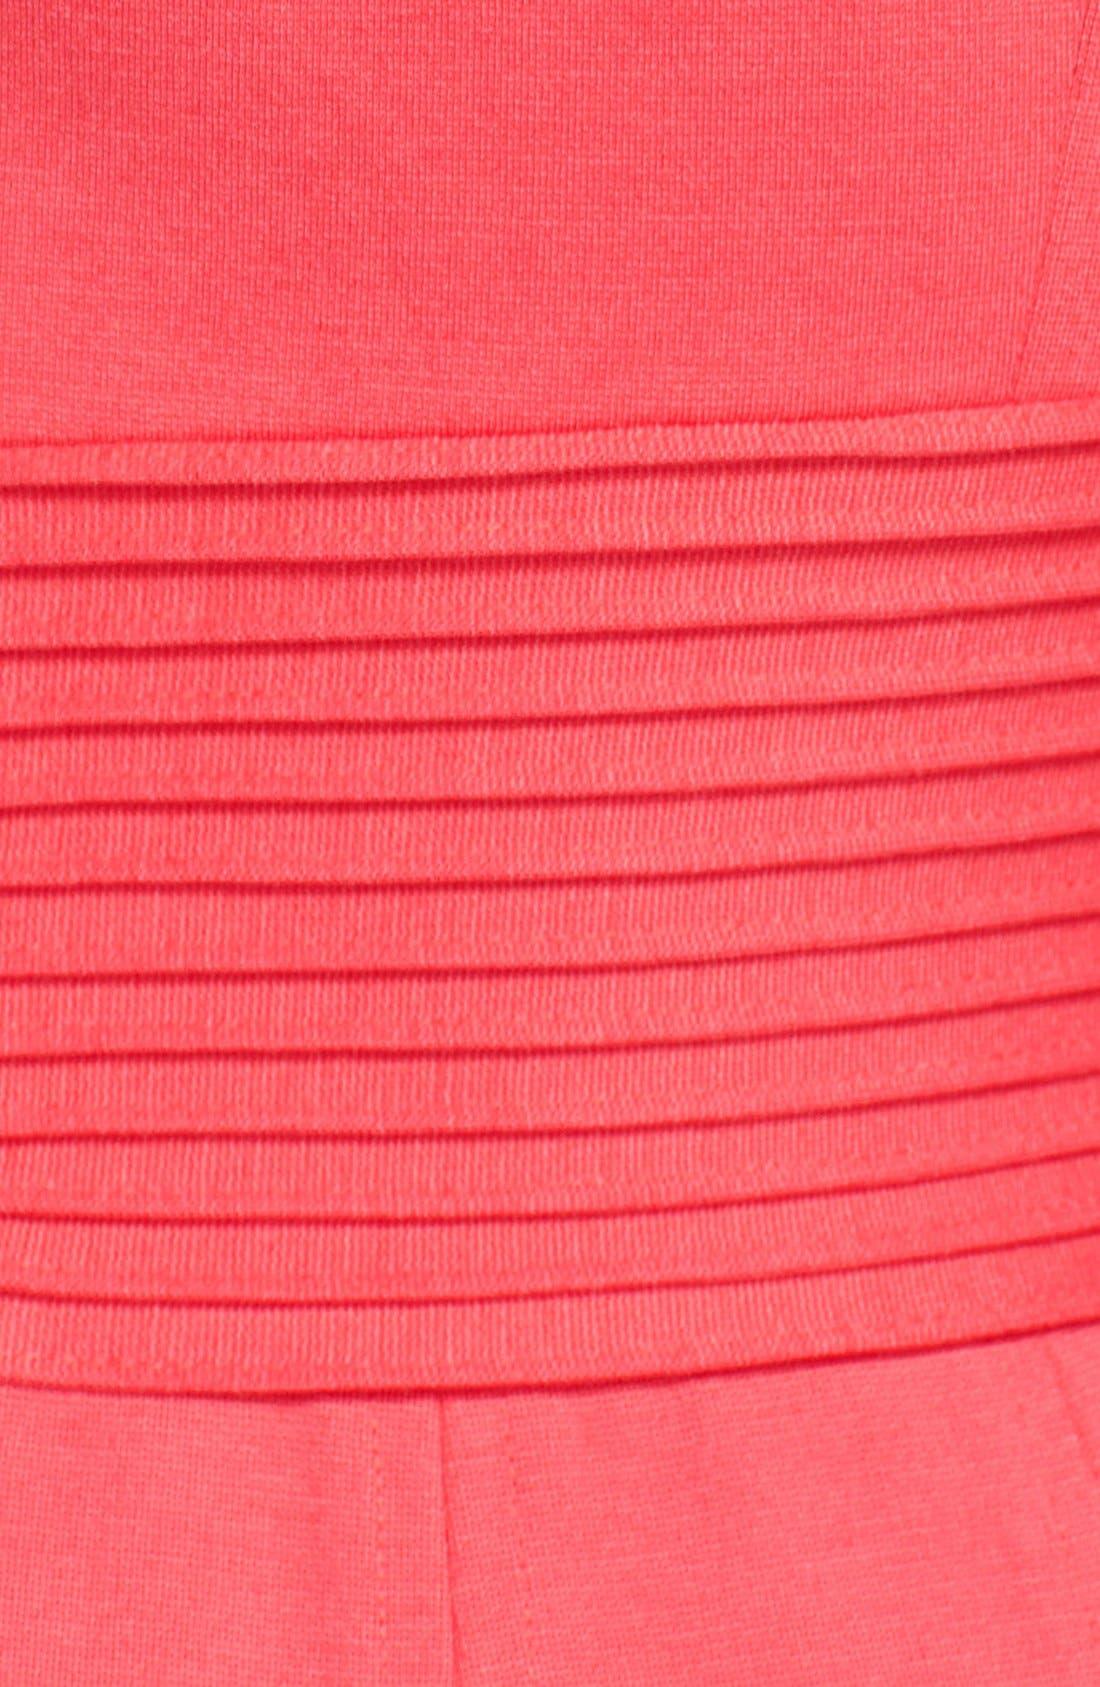 Alternate Image 4  - Eliza J Pintucked Waist Seamed Ponte Knit Fit & Flare Dress